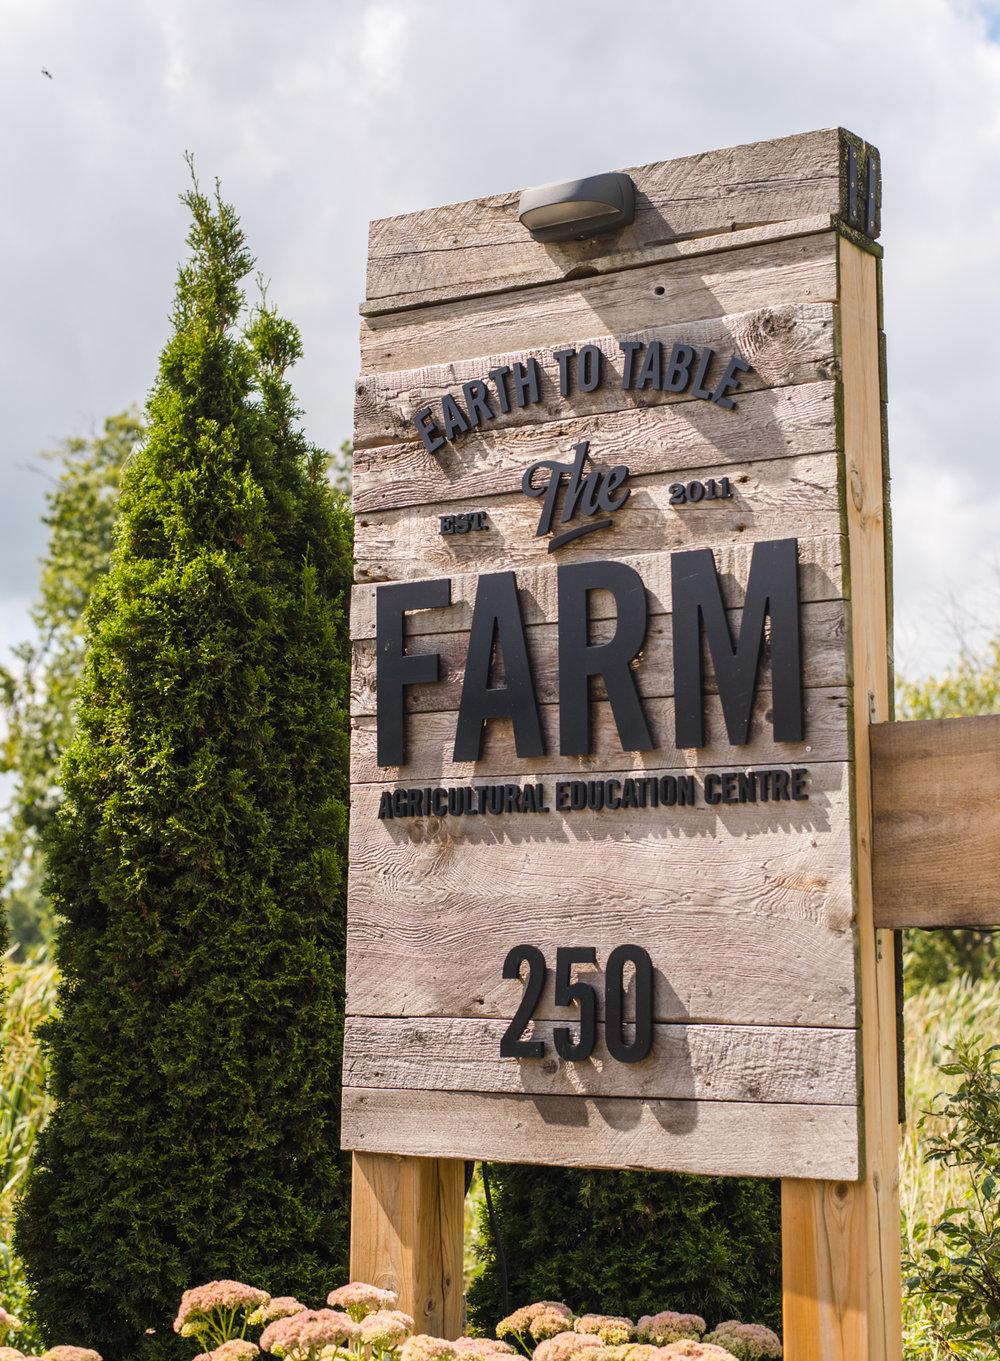 James & Laura's Barn Wedding The Farm Pearle Weddings Company Earth to Table Flamborough Hamilton Ontario Waterdown Outdoor Summer Aidan Hennebry of Hush Hush Photography & Film-5.jpg